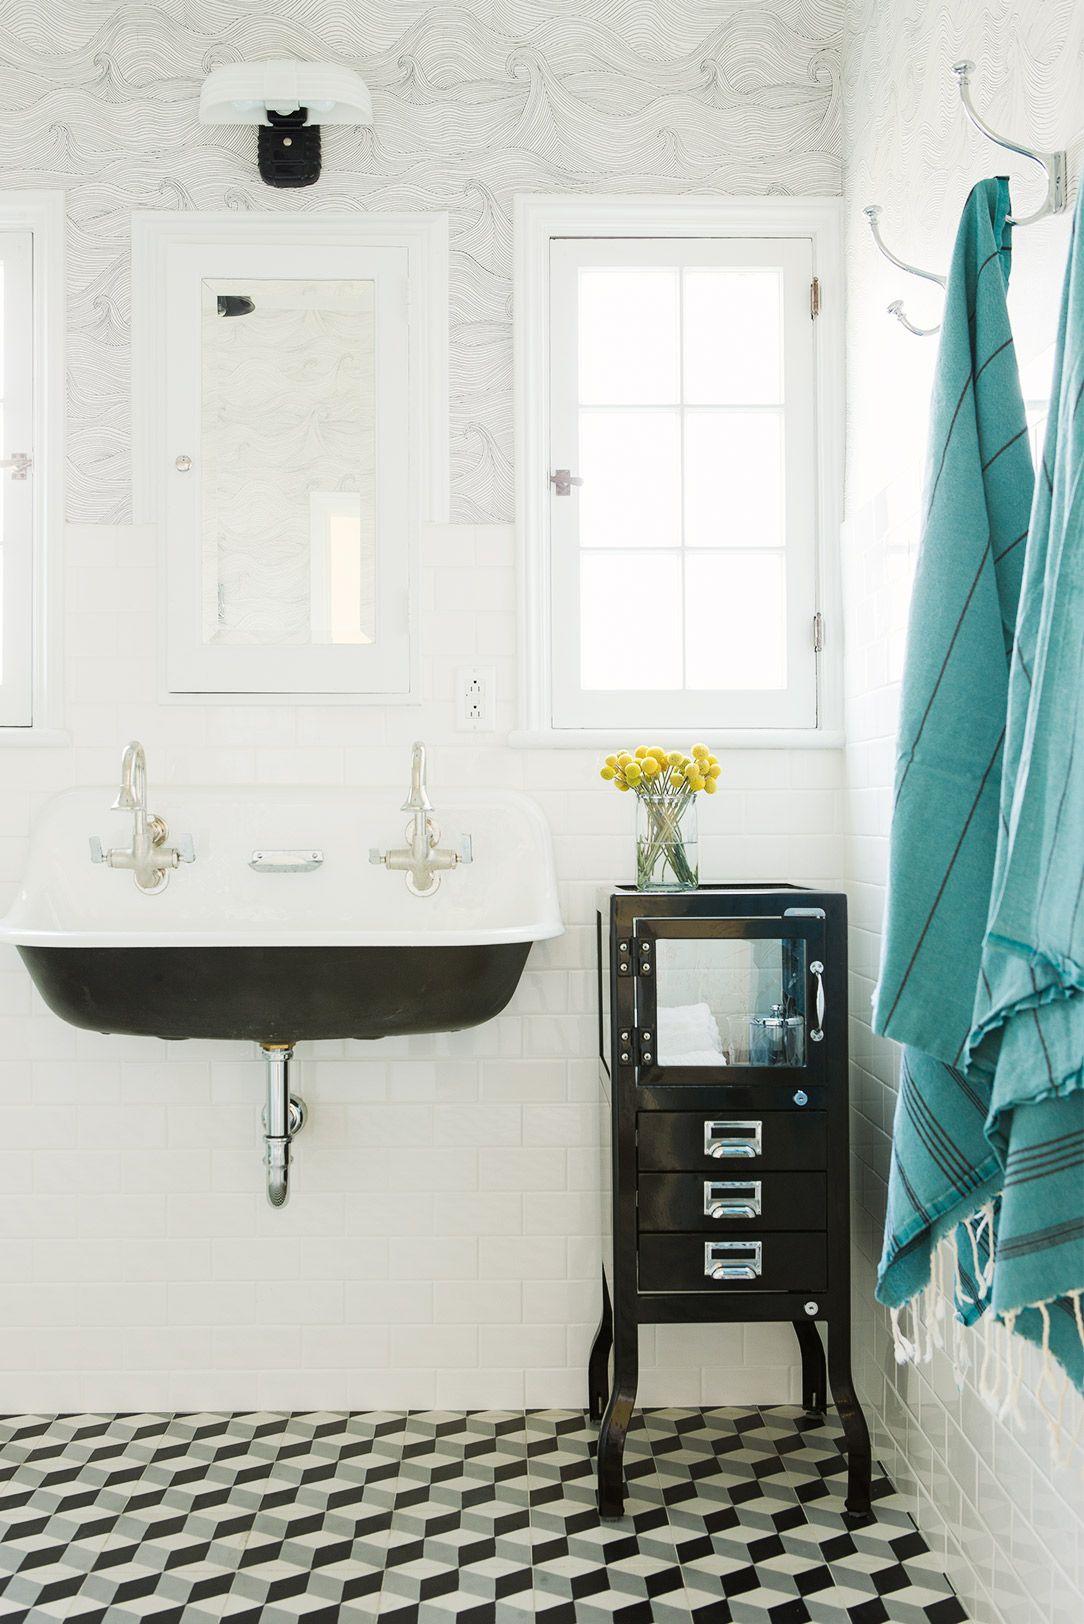 Designer Crush: Cuffhome | Towels, Bath and Sinks